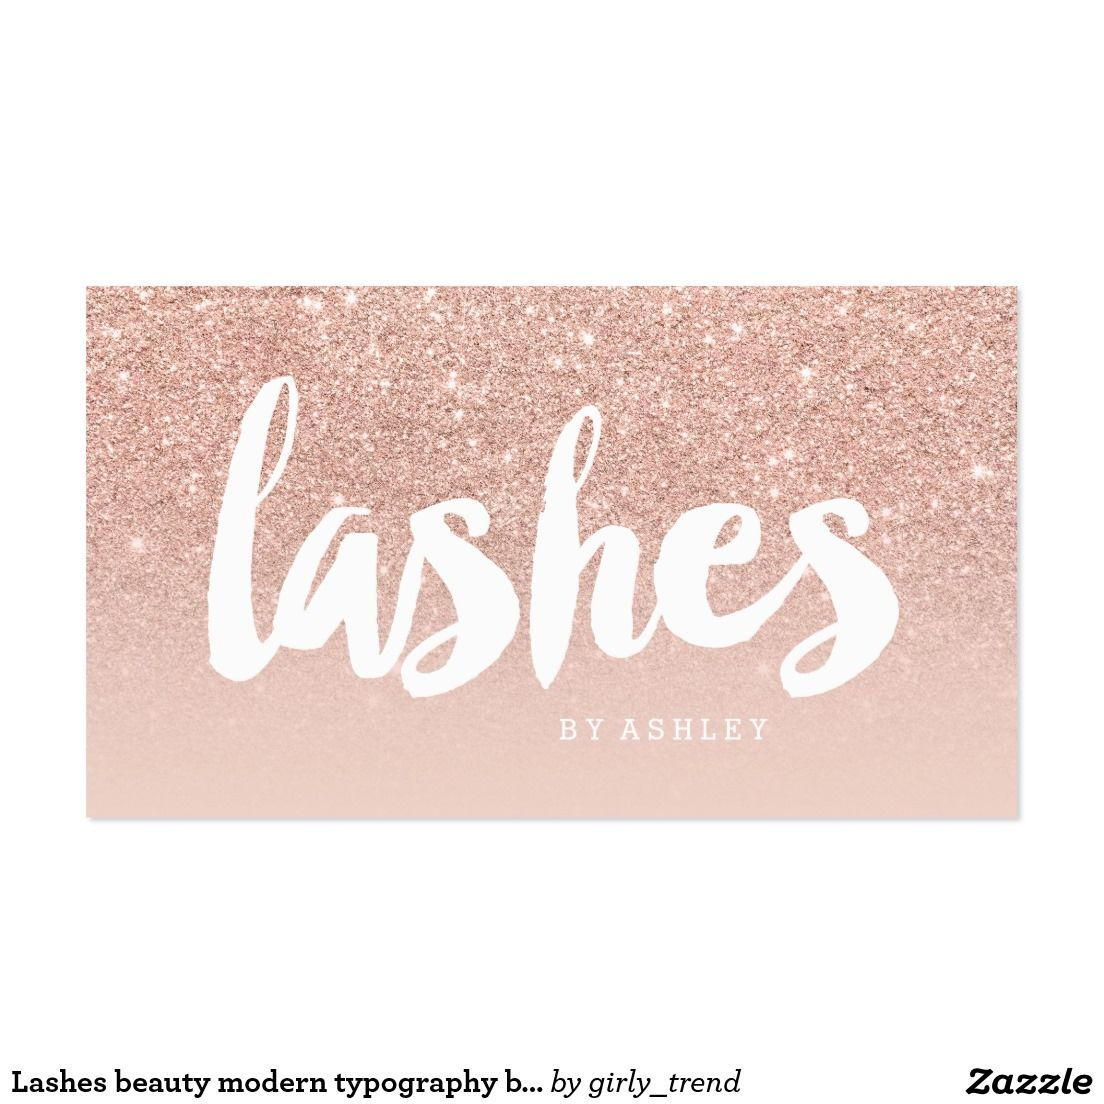 Lashes beauty modern typography blush rose gold business card lashes beauty modern typography blush rose gold business card magicingreecefo Gallery